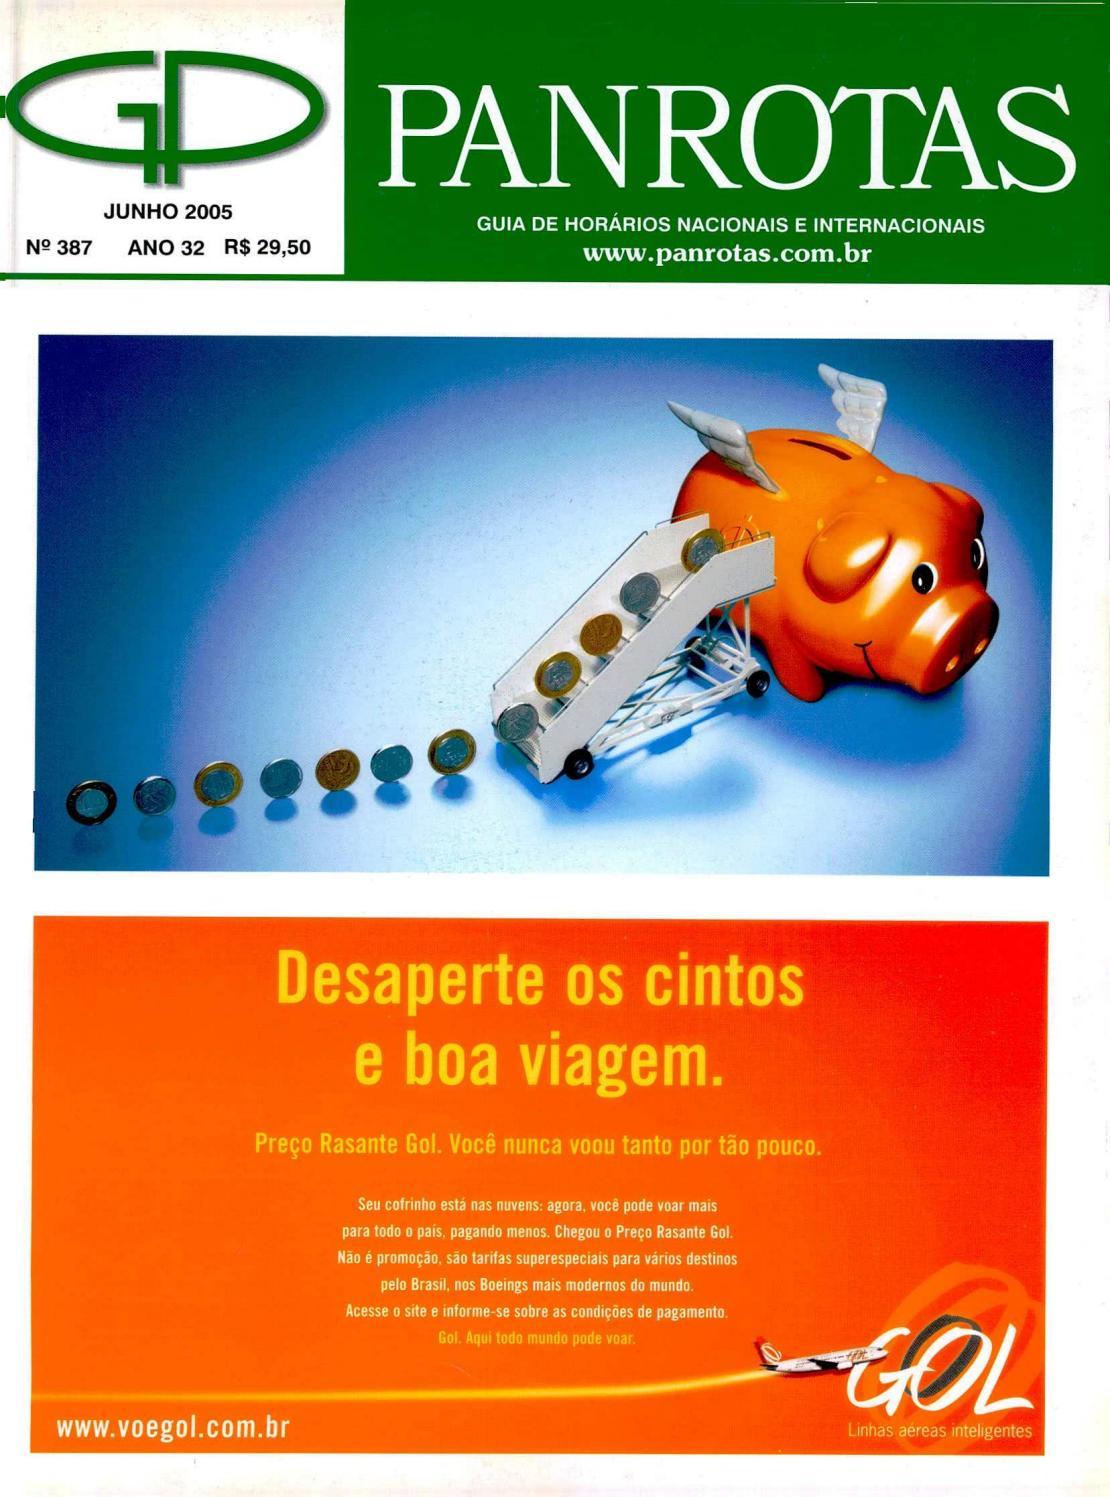 61b36571ba4 Guia PANROTAS - Edição 387 - Junho 2005 by PANROTAS Editora - issuu